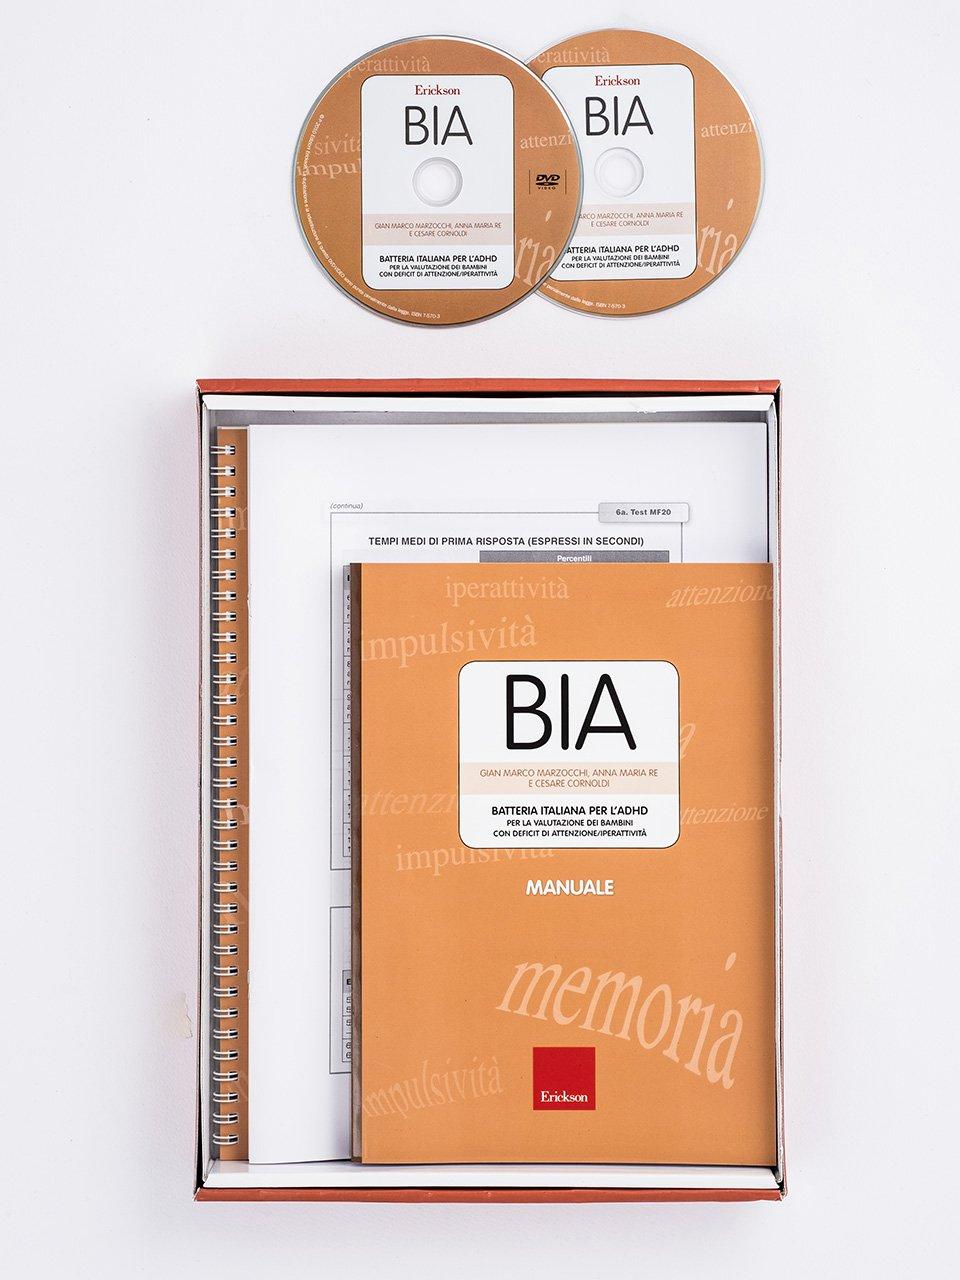 BIA - Batteria italiana per l'ADHD - Libri - Erickson 3